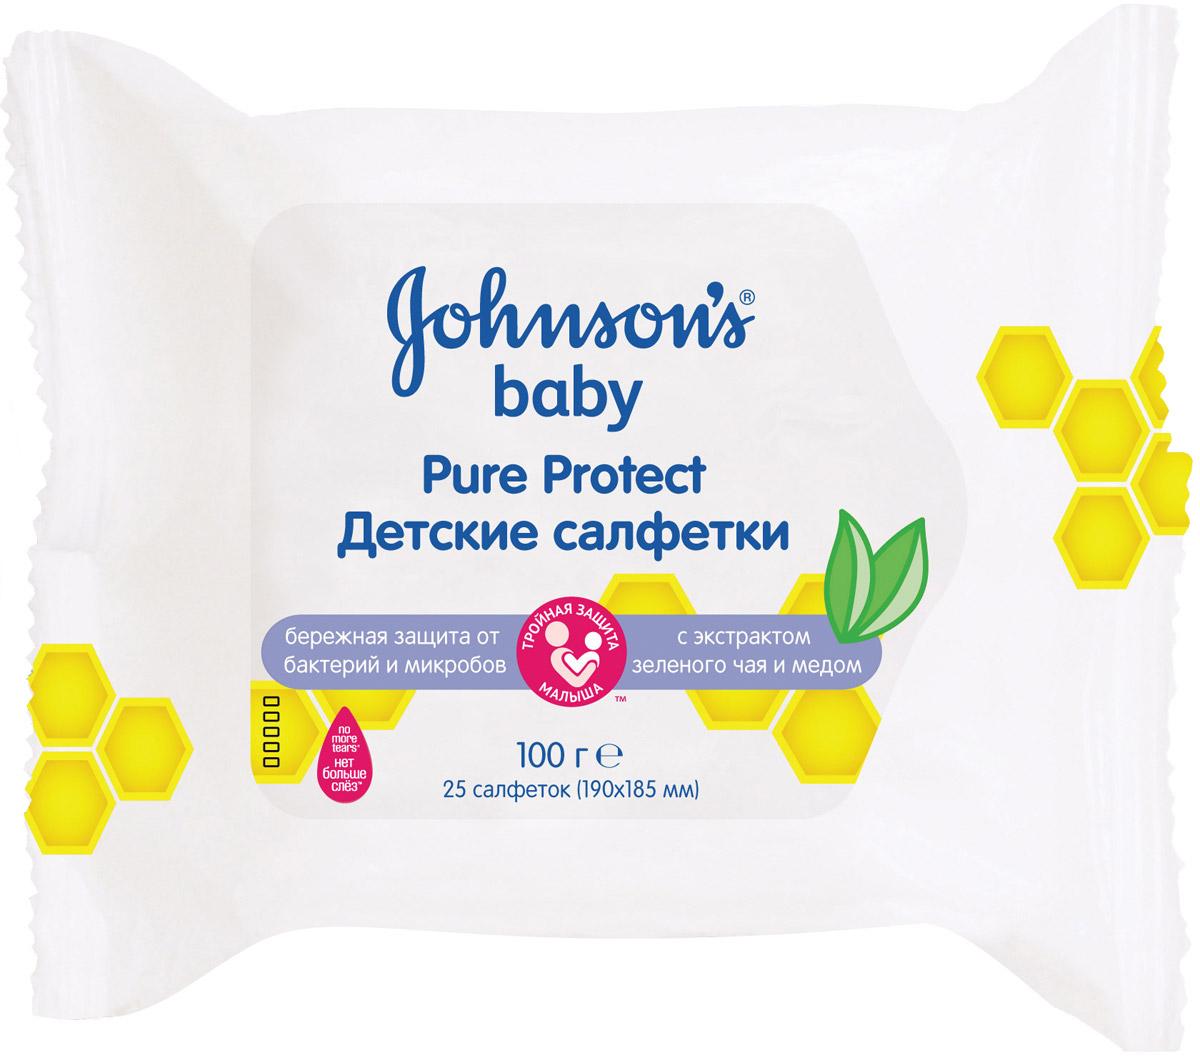 Johnson's baby Pure Protect Влажные салфетки 25 шт johnson's baby